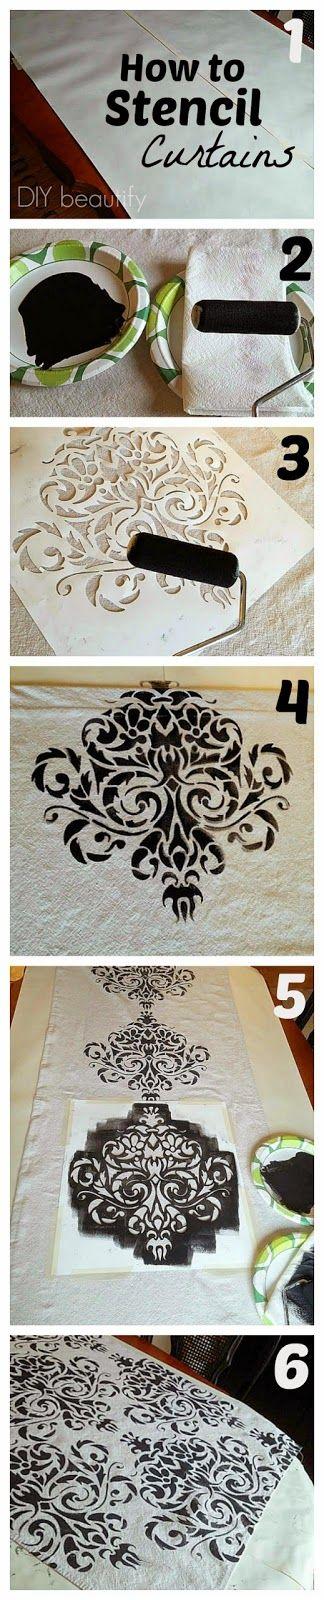 How to stencil curtains www.diybeautify.com